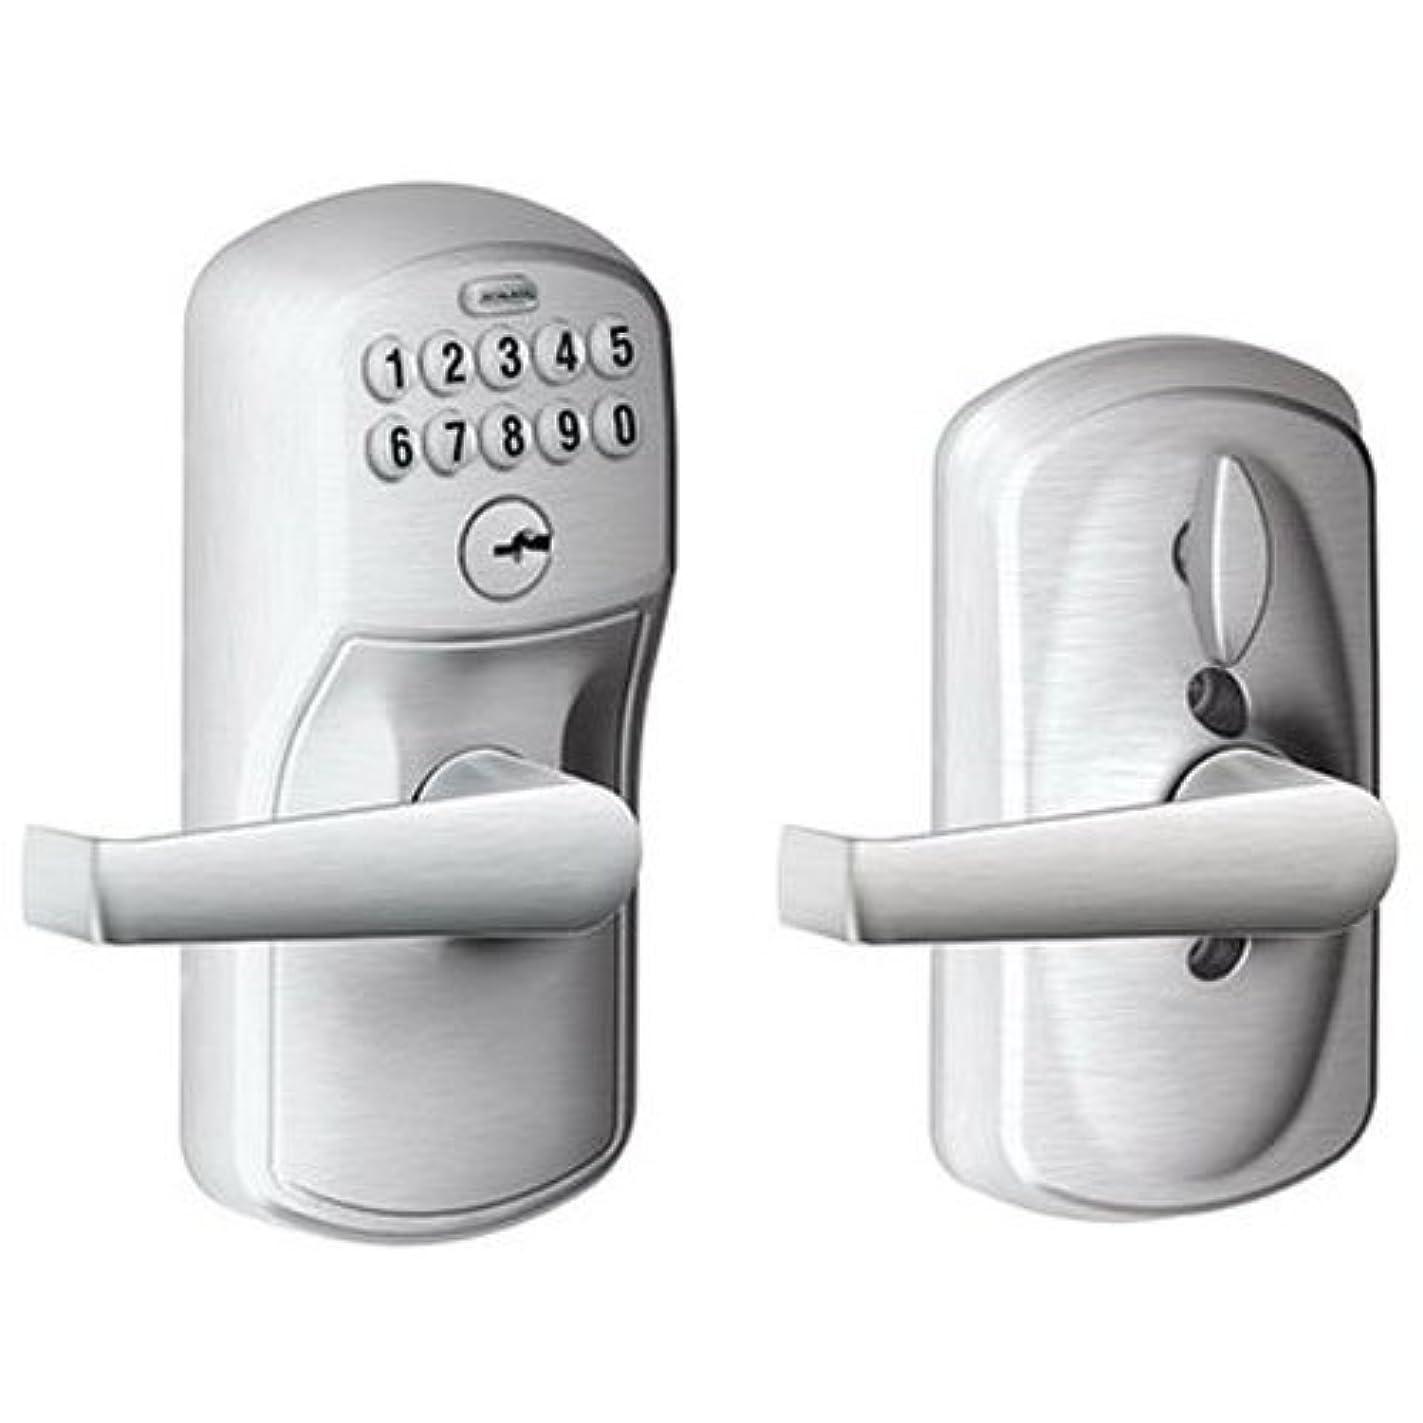 Schlage FE595CS V PLY 626 ELA Plymouth Light Commercial Electronic Keypad Lock with Elan Lever, Brushed Chrome